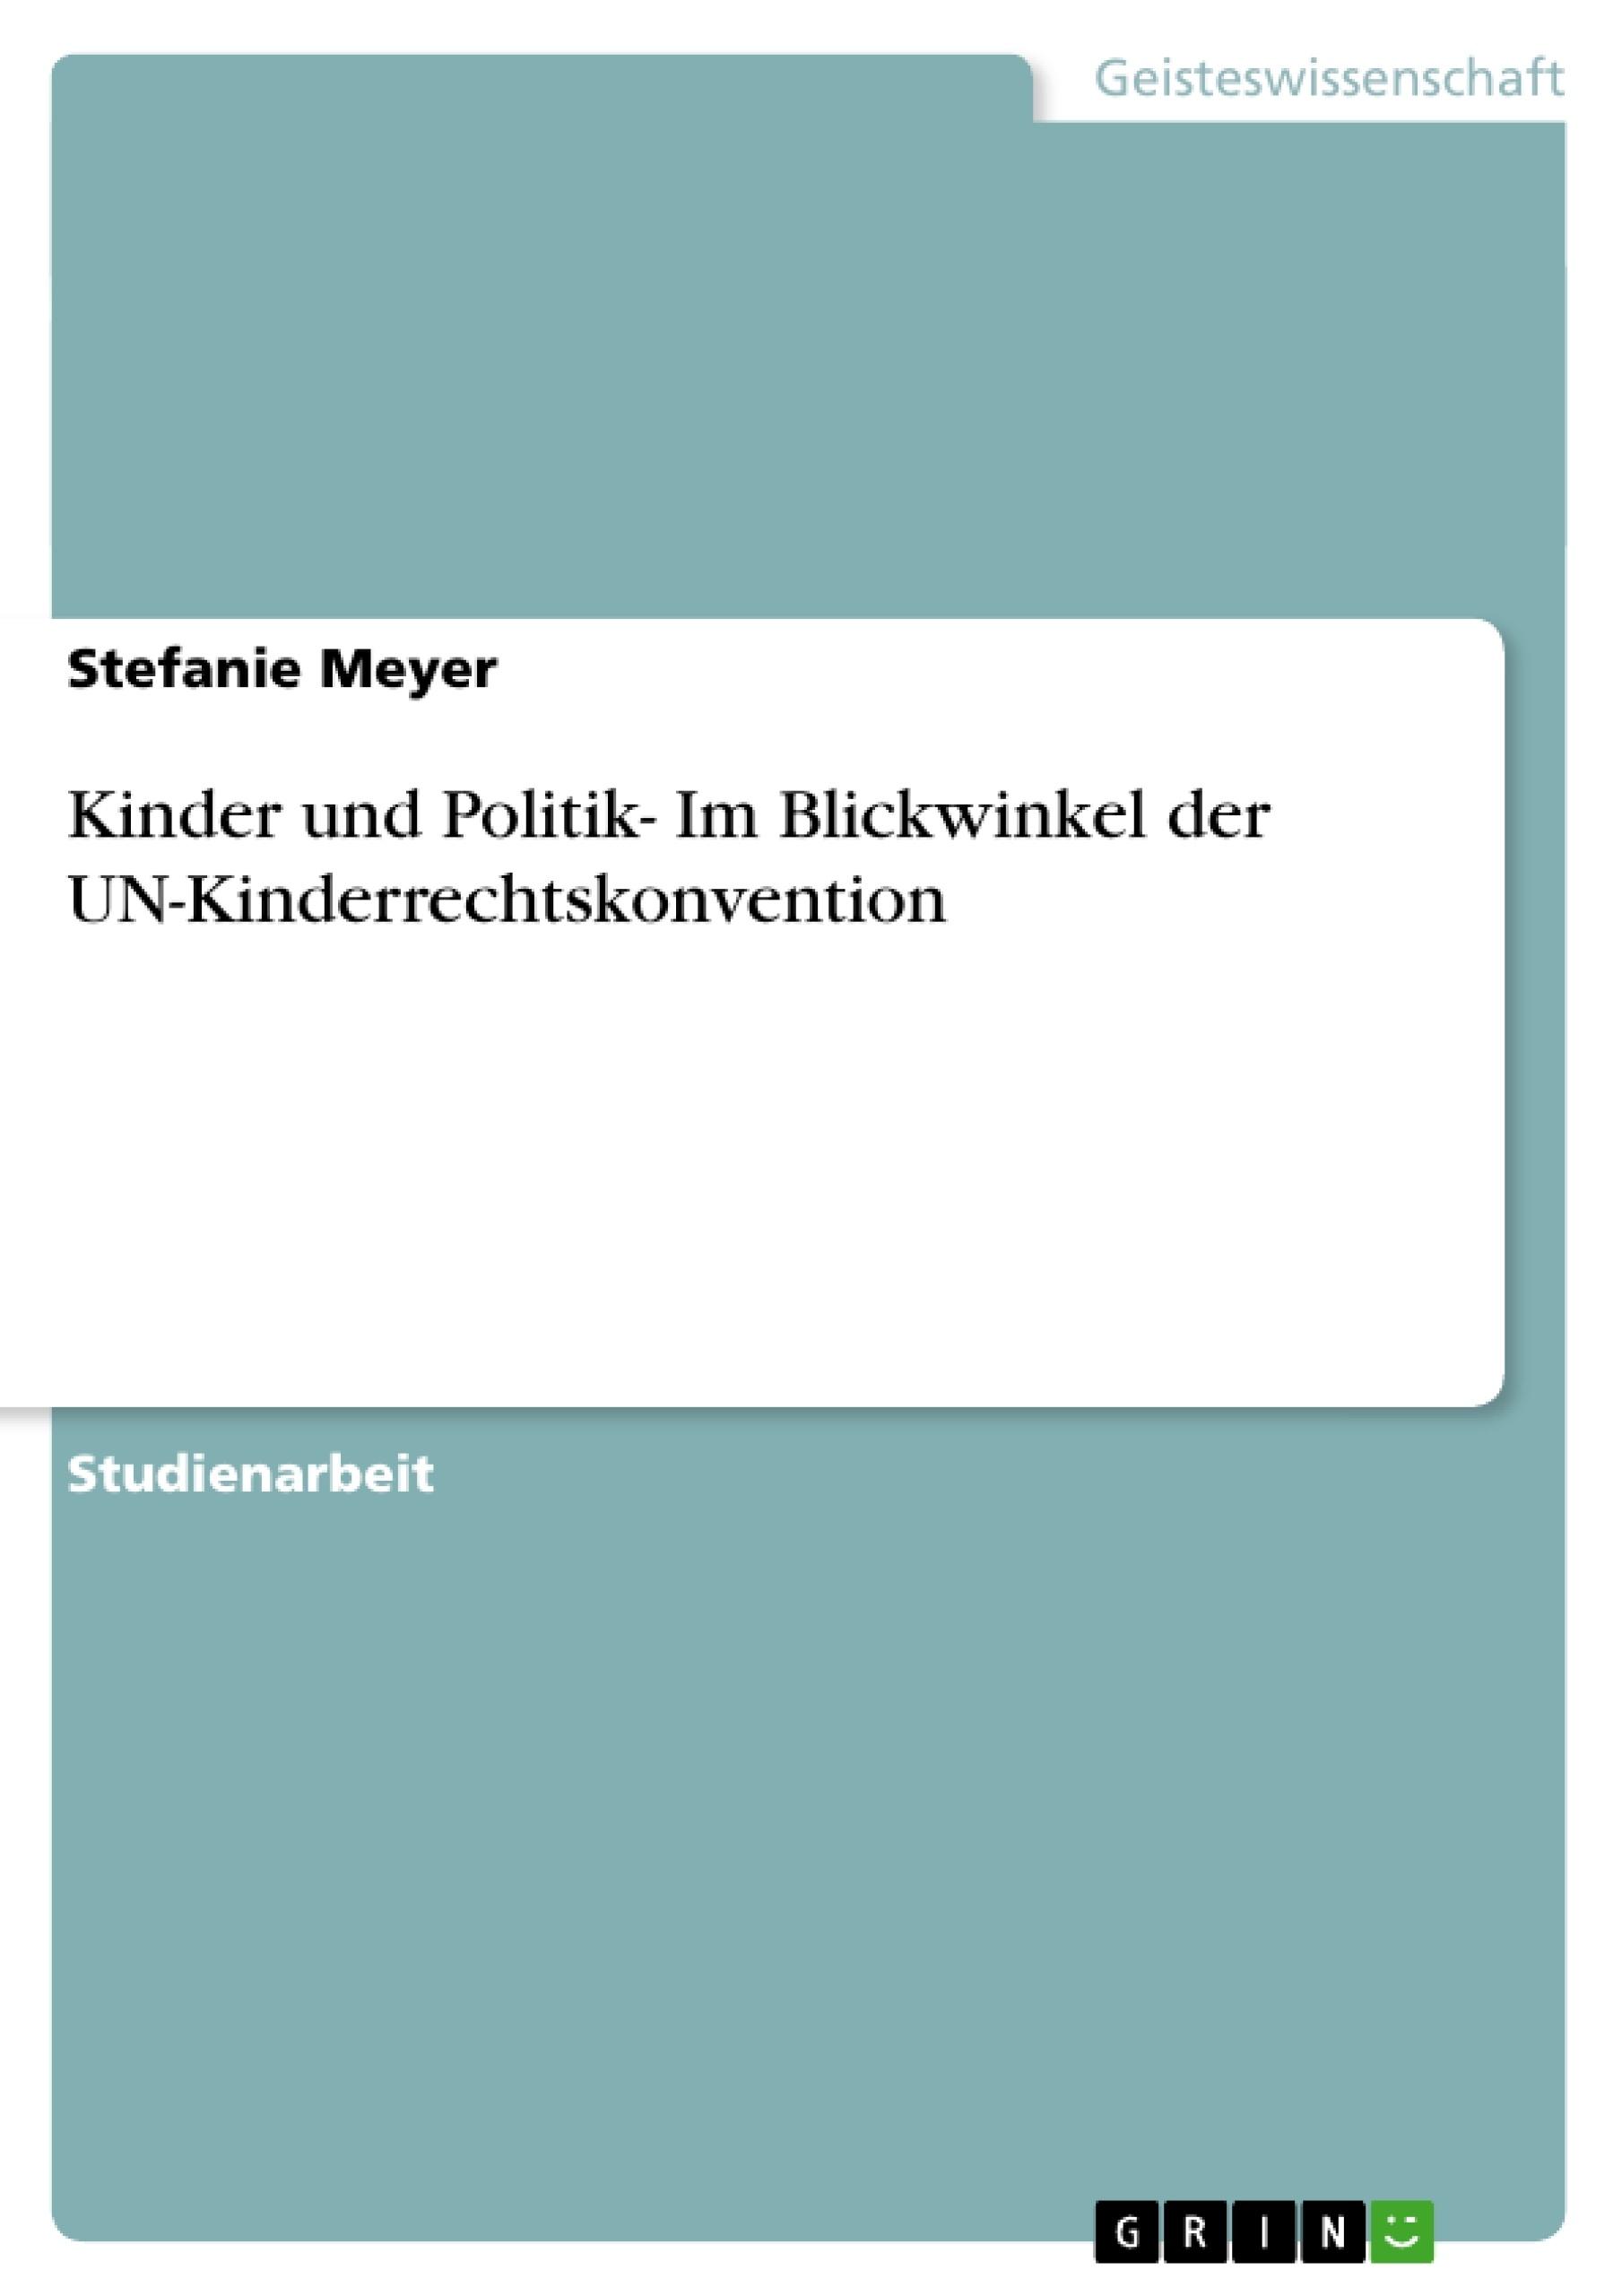 Titel: Kinder und Politik- Im Blickwinkel der UN-Kinderrechtskonvention